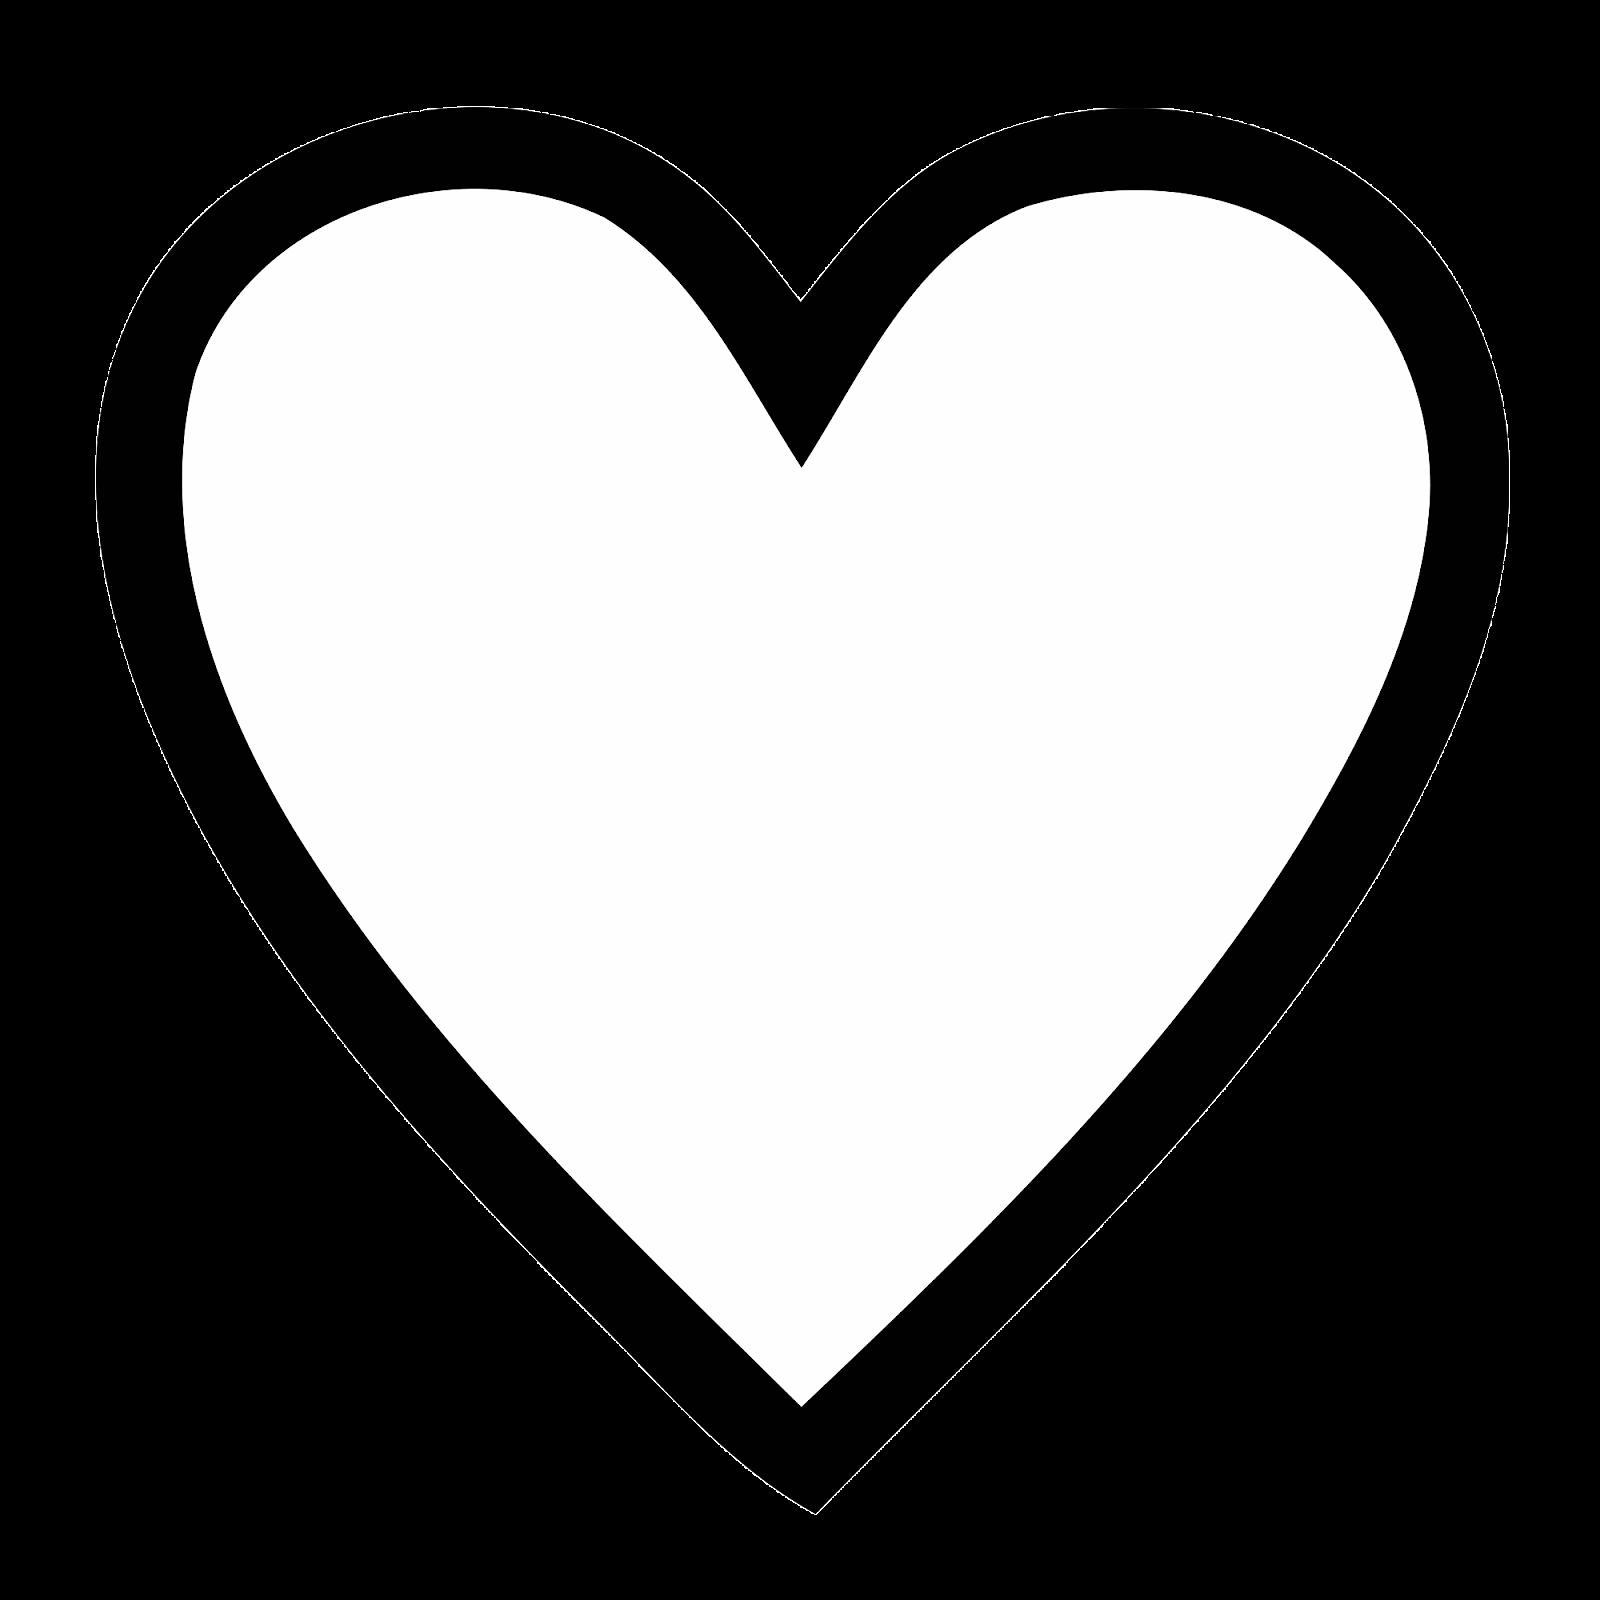 Line Drawing Heart Shape Line Drawing Heart Outline Tattoo Heart Tattoo Heart Template